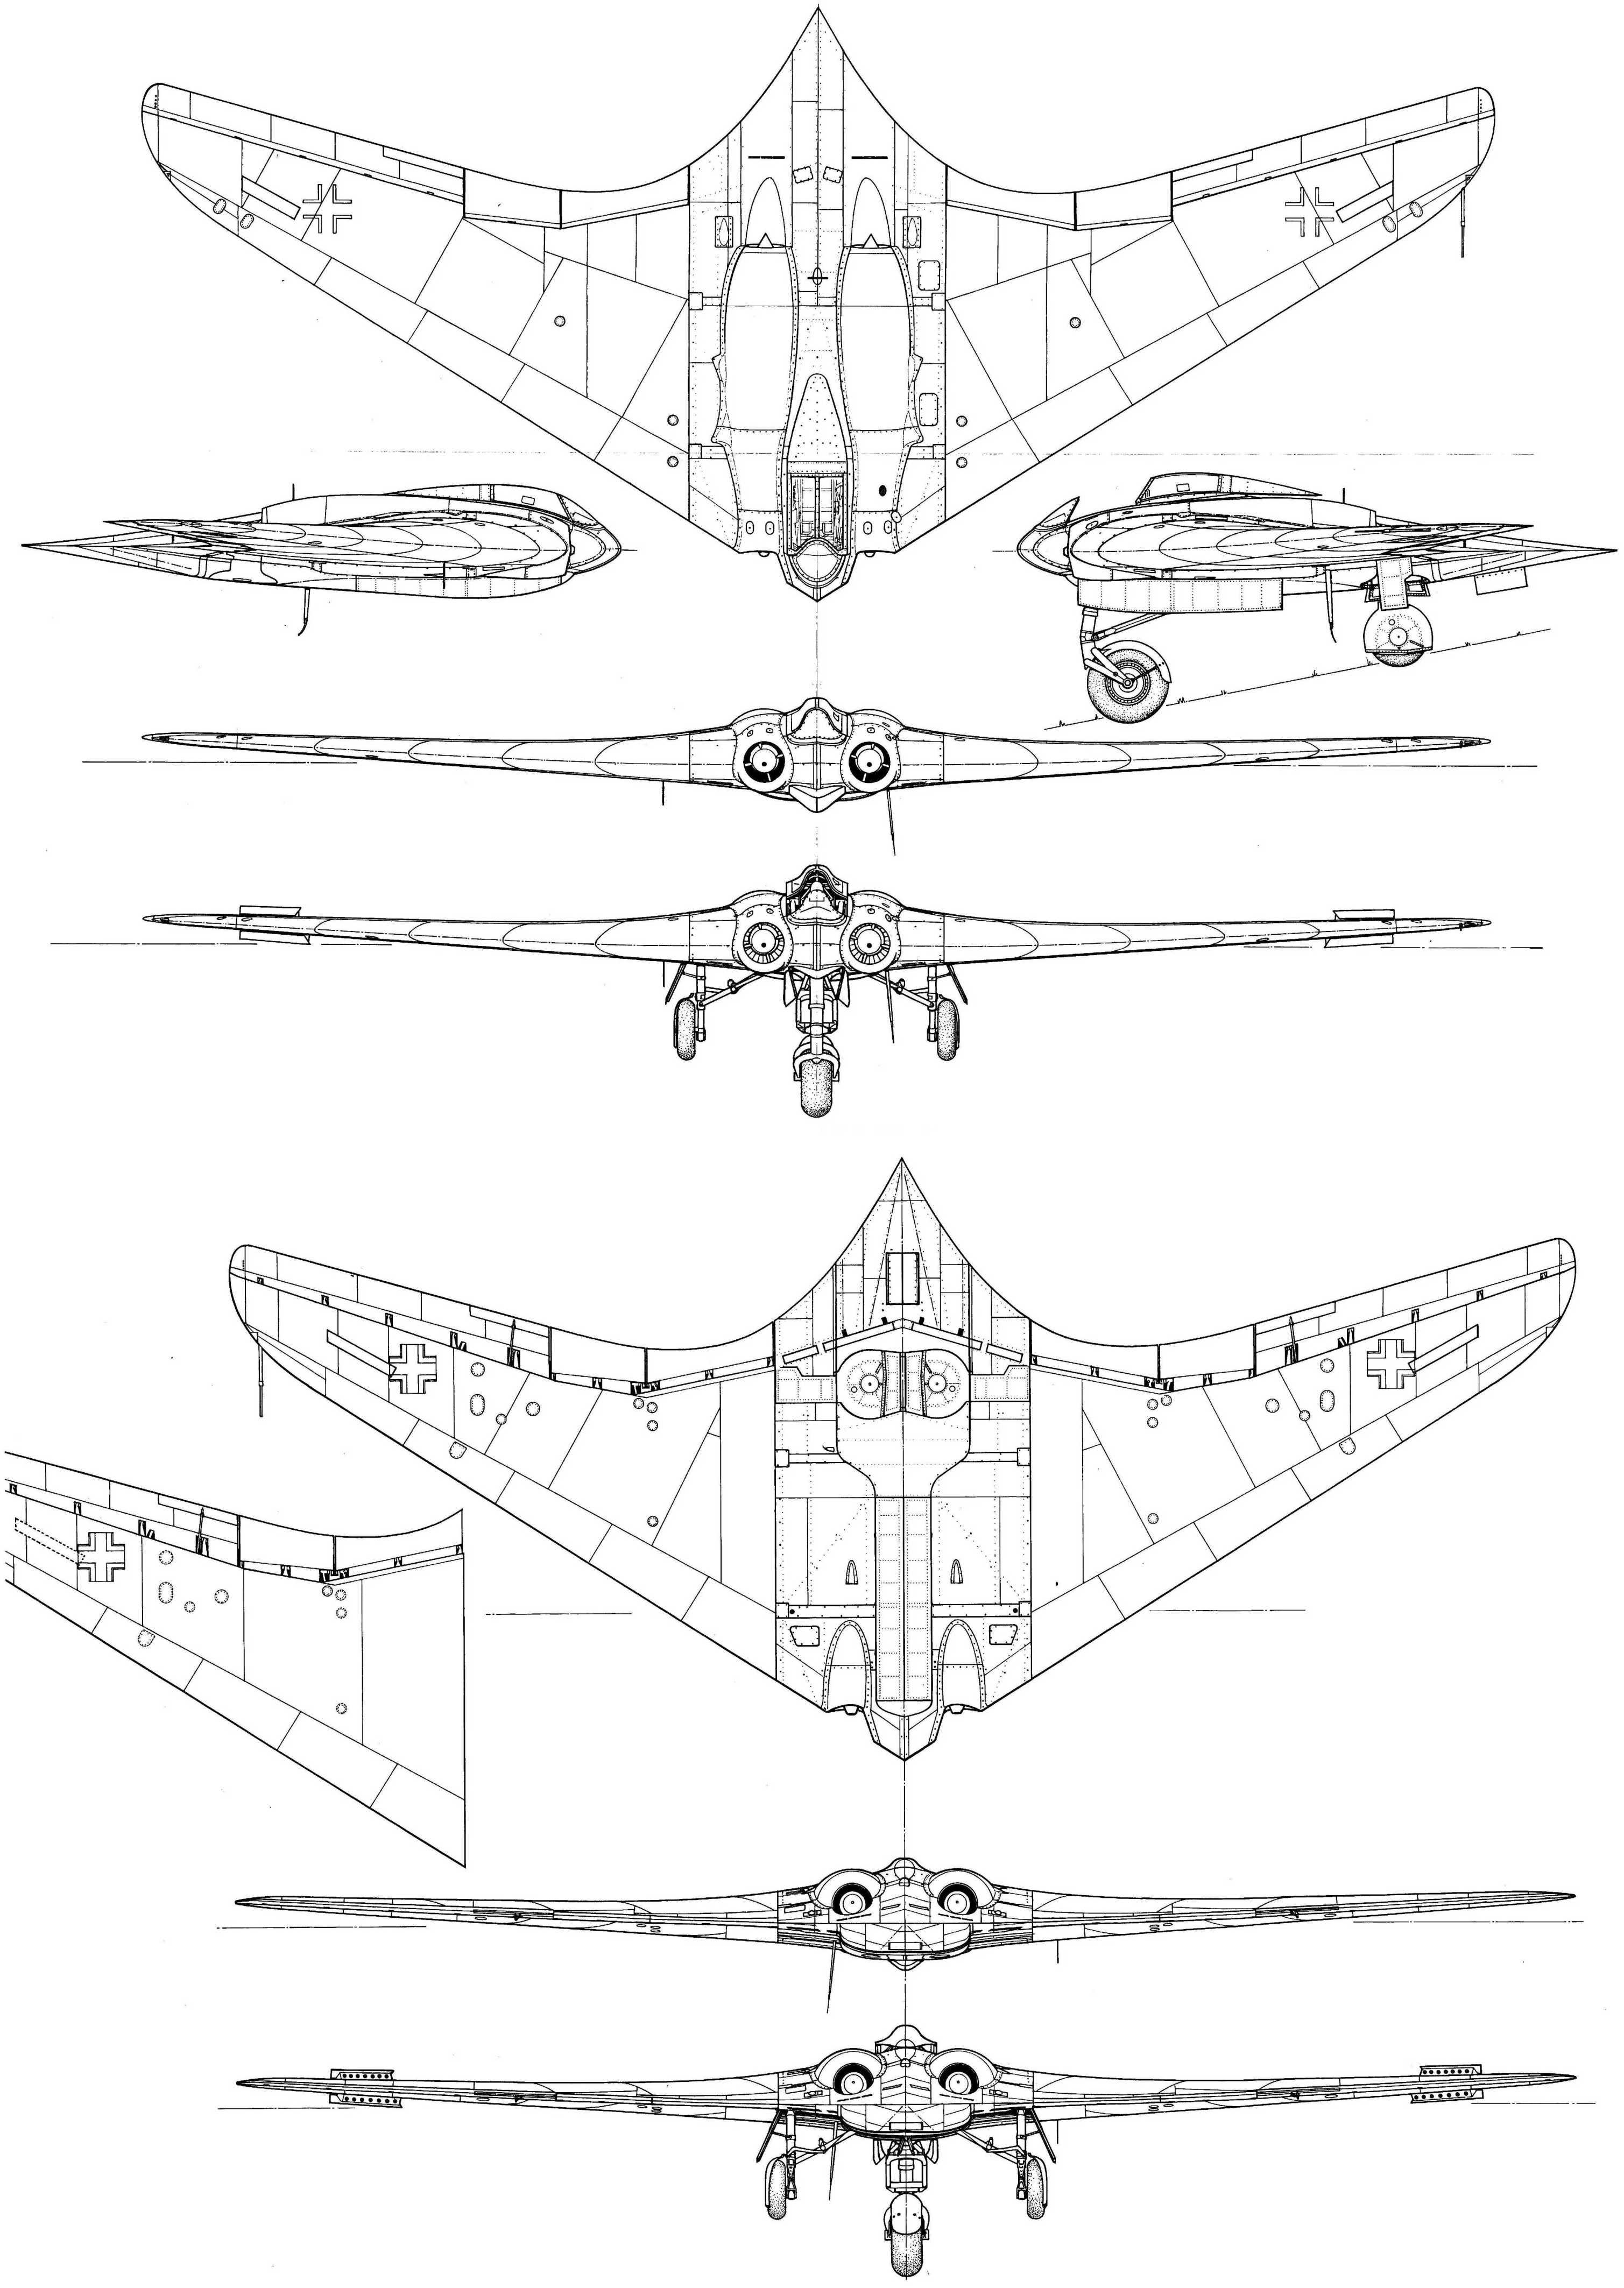 Horten ho-229A Blueprint - Download free blueprint for 3D modeling